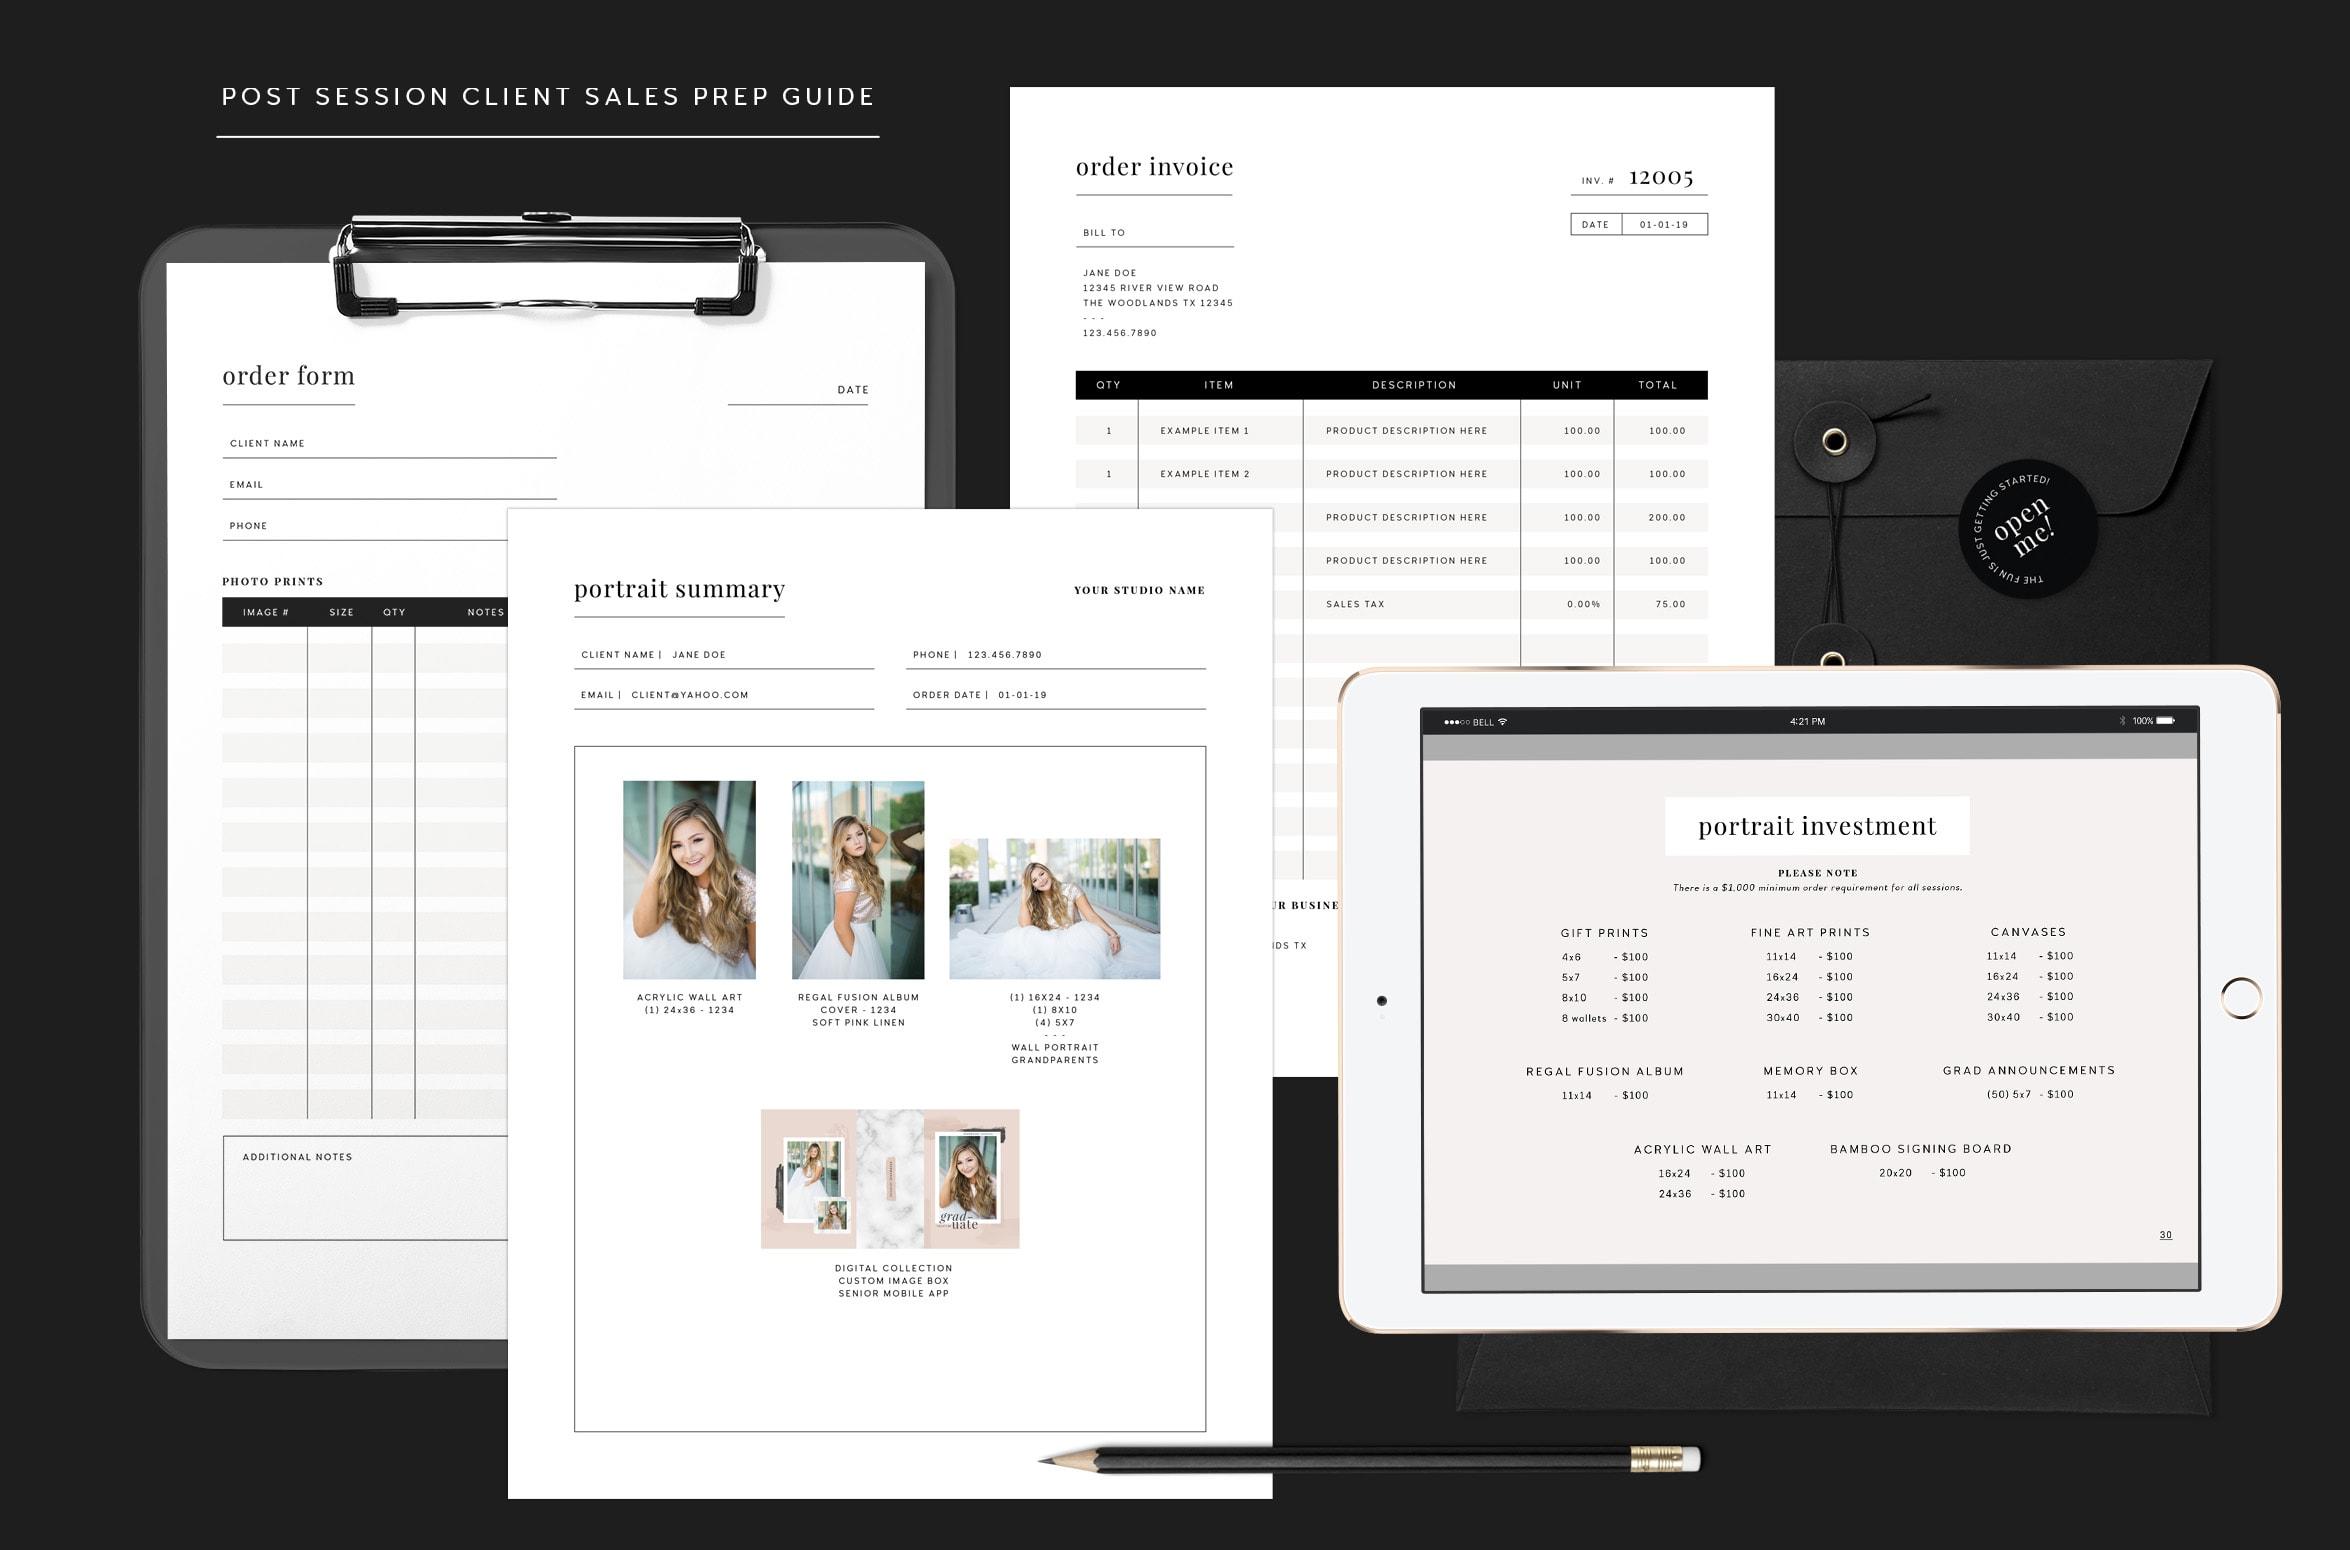 Post Session Client Sales Prep Guide